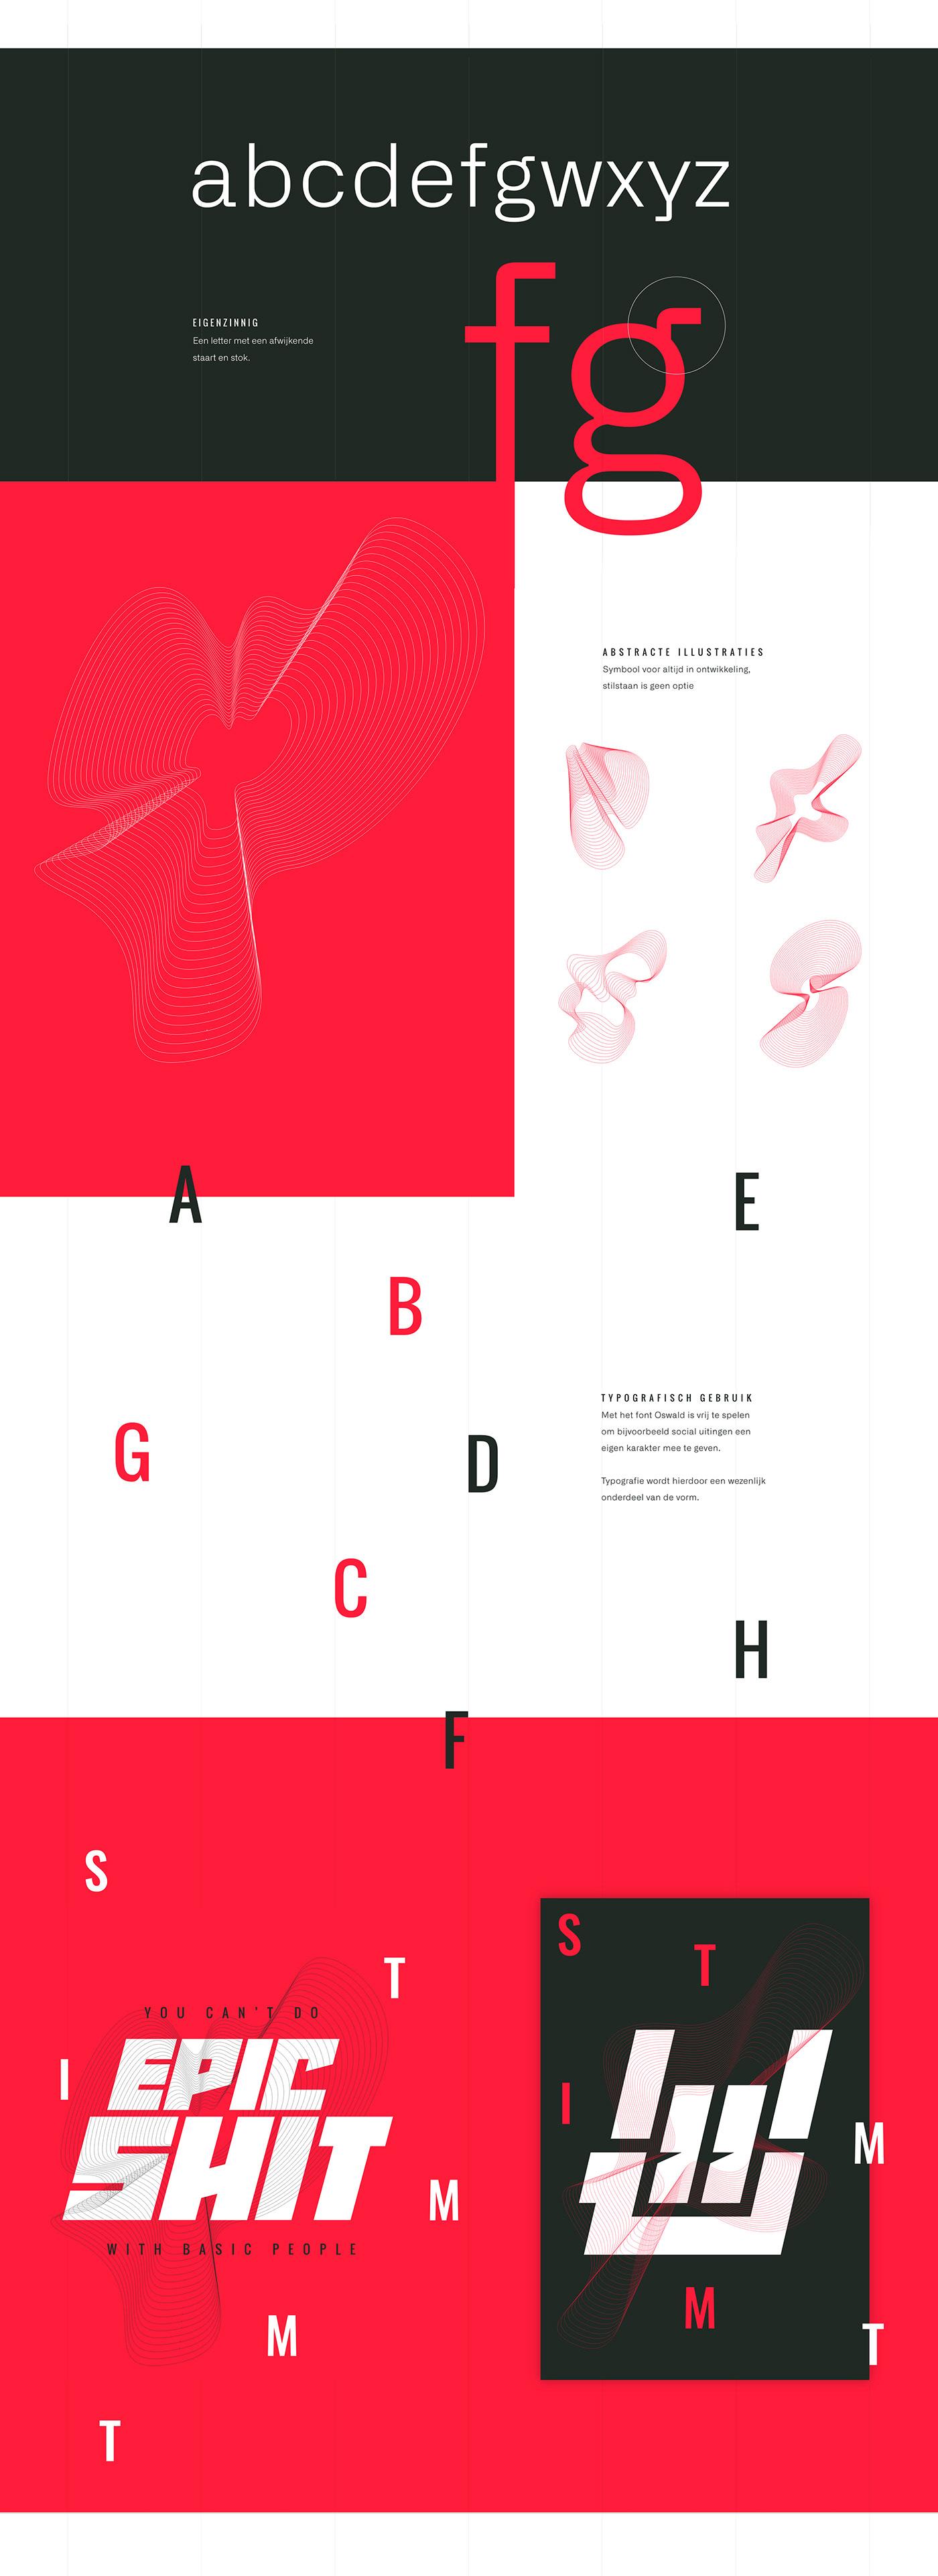 branding  Photography  logodesign logo typography   Corporate Identity ui design black and white agency digital